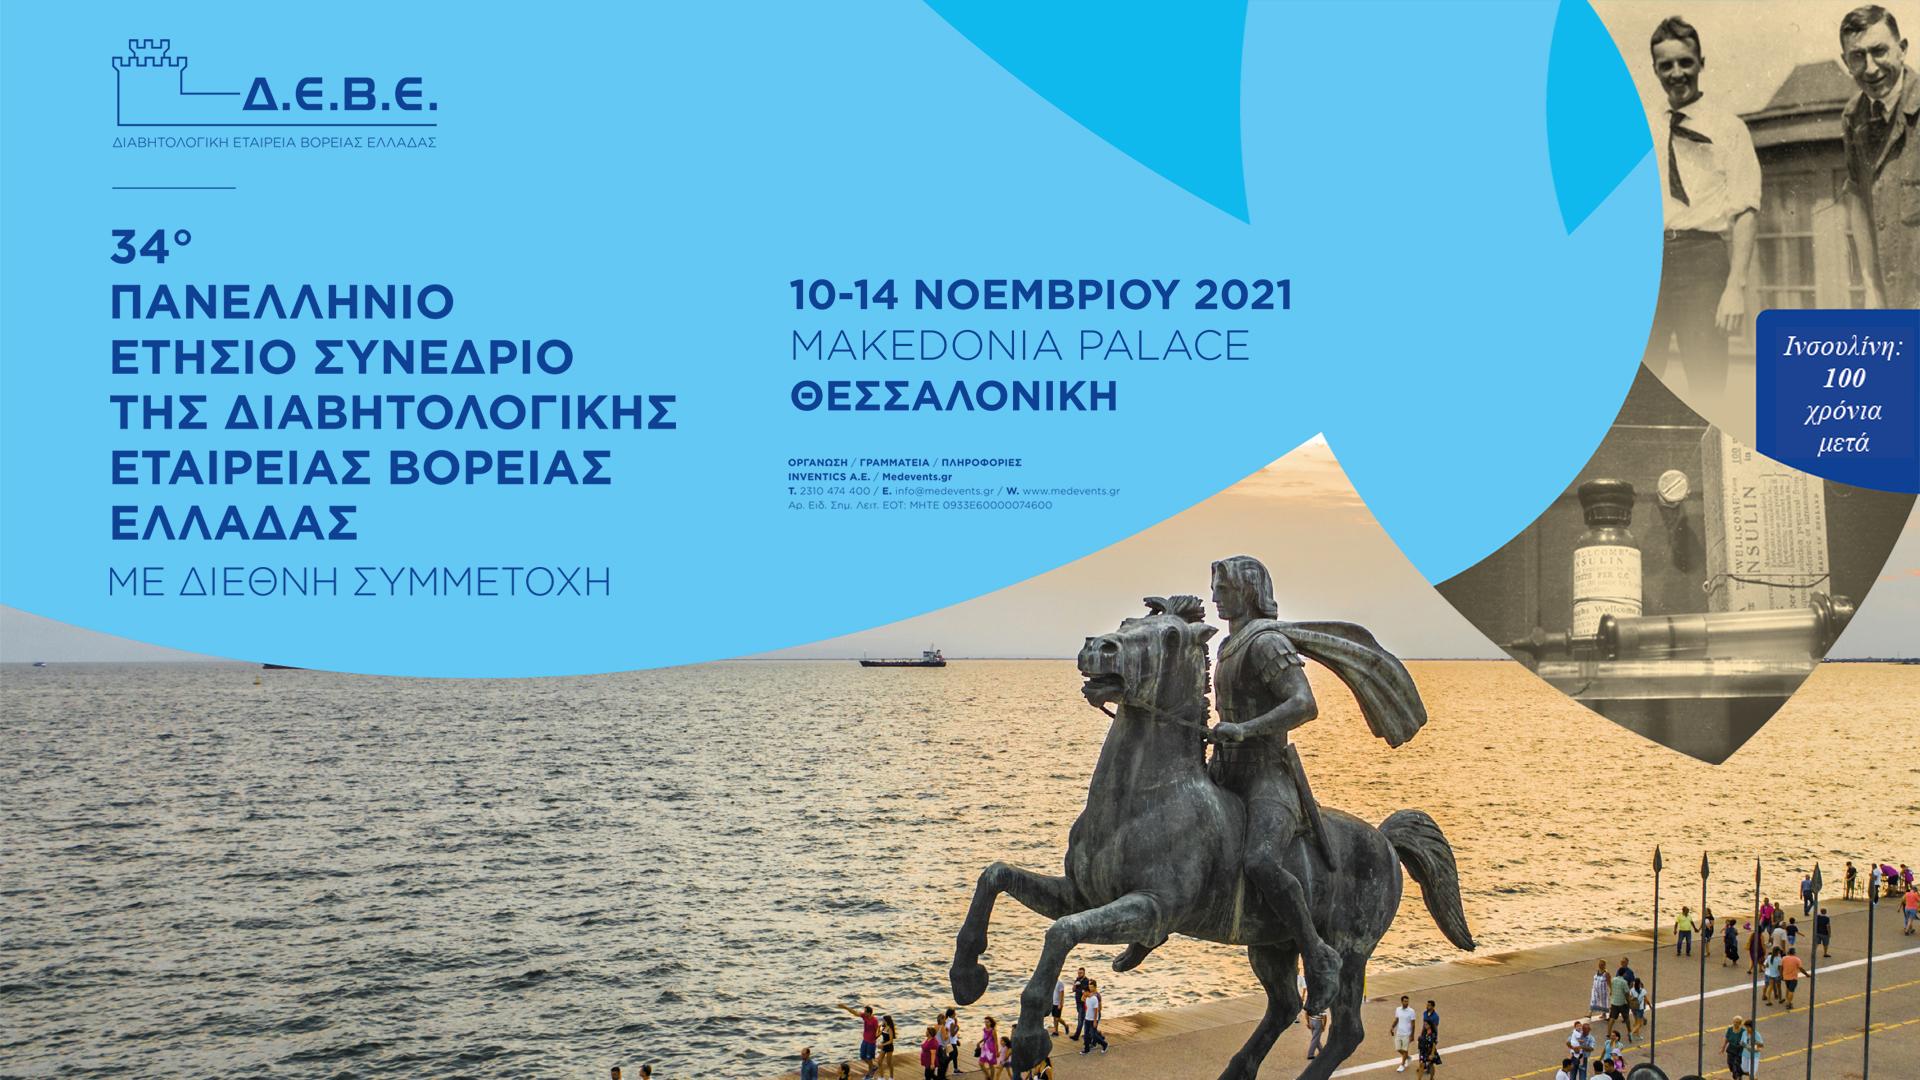 34o Πανελλήνιο Ετήσιο Συνέδριο της Διαβητολογικής Εταιρείας Βόρειας Ελλάδας